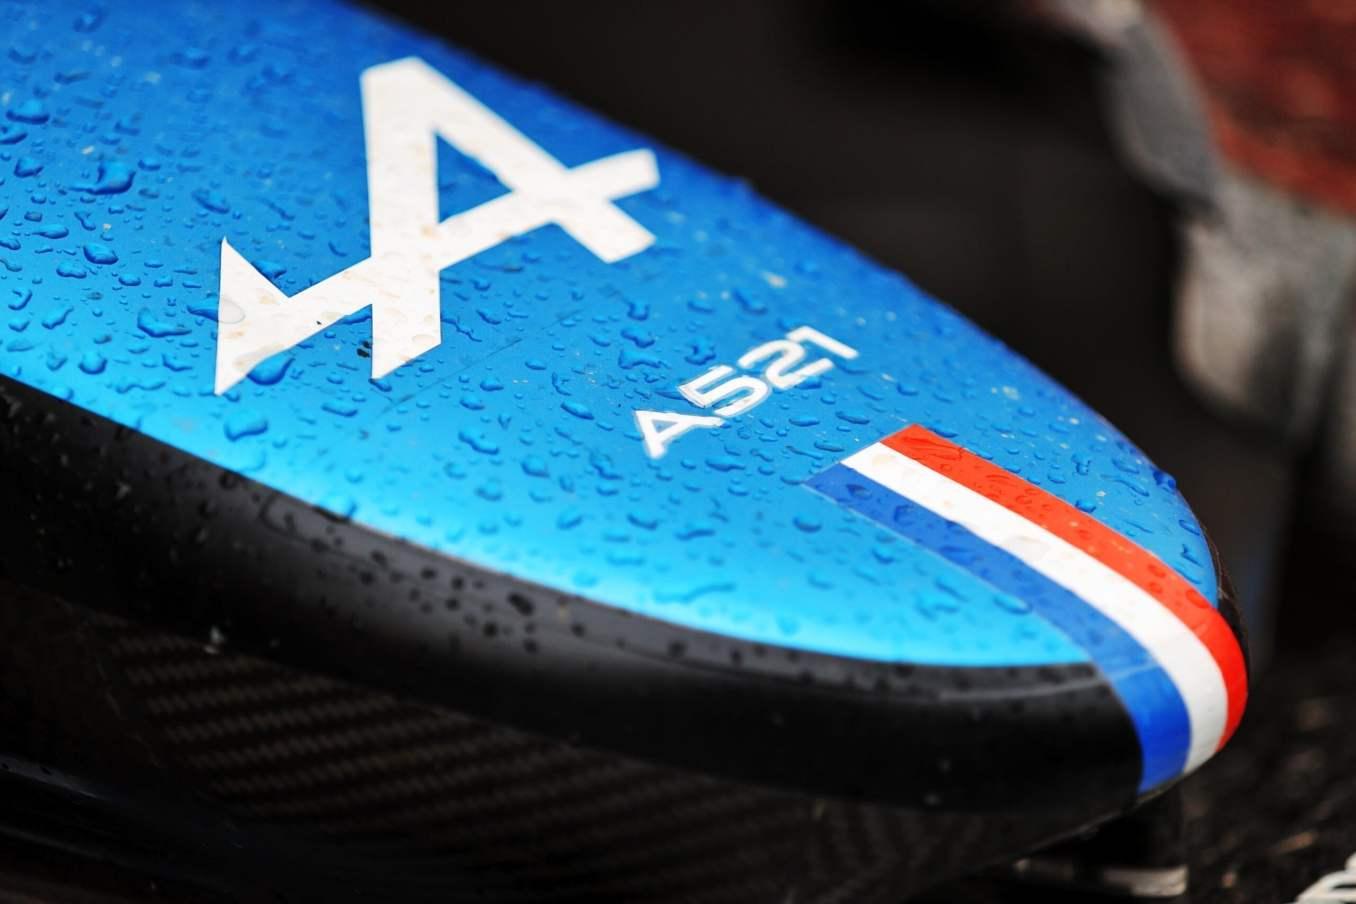 Alpine F1 Team A521 Grand Prix France Castellet 2021 Course